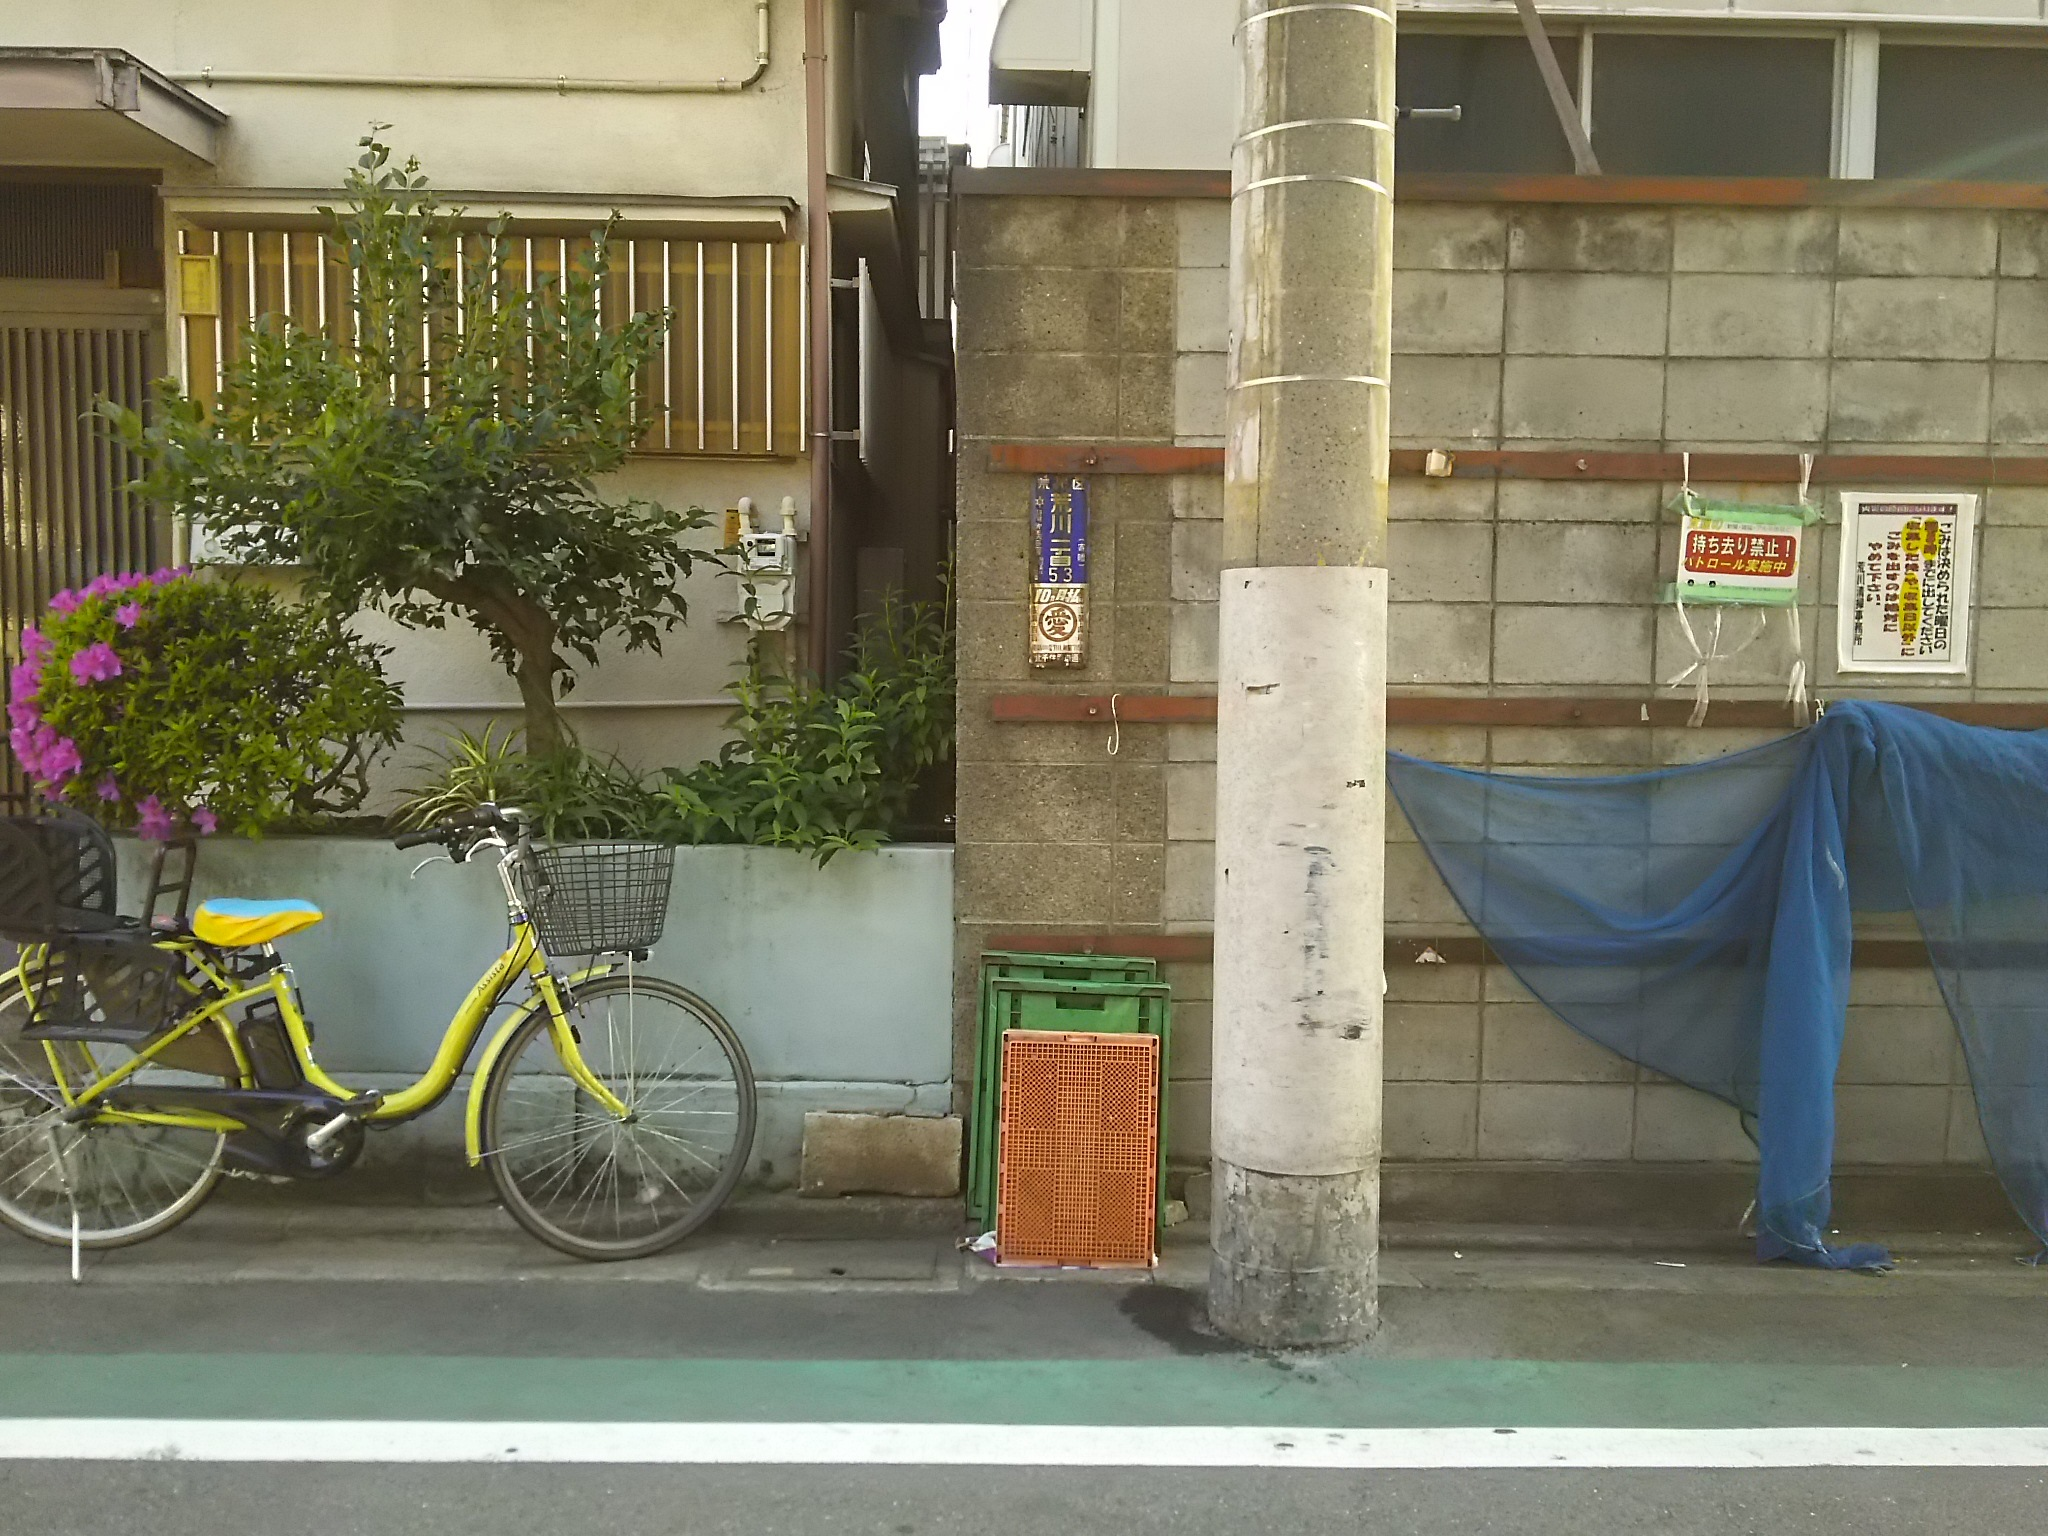 DSC_9140.jpg